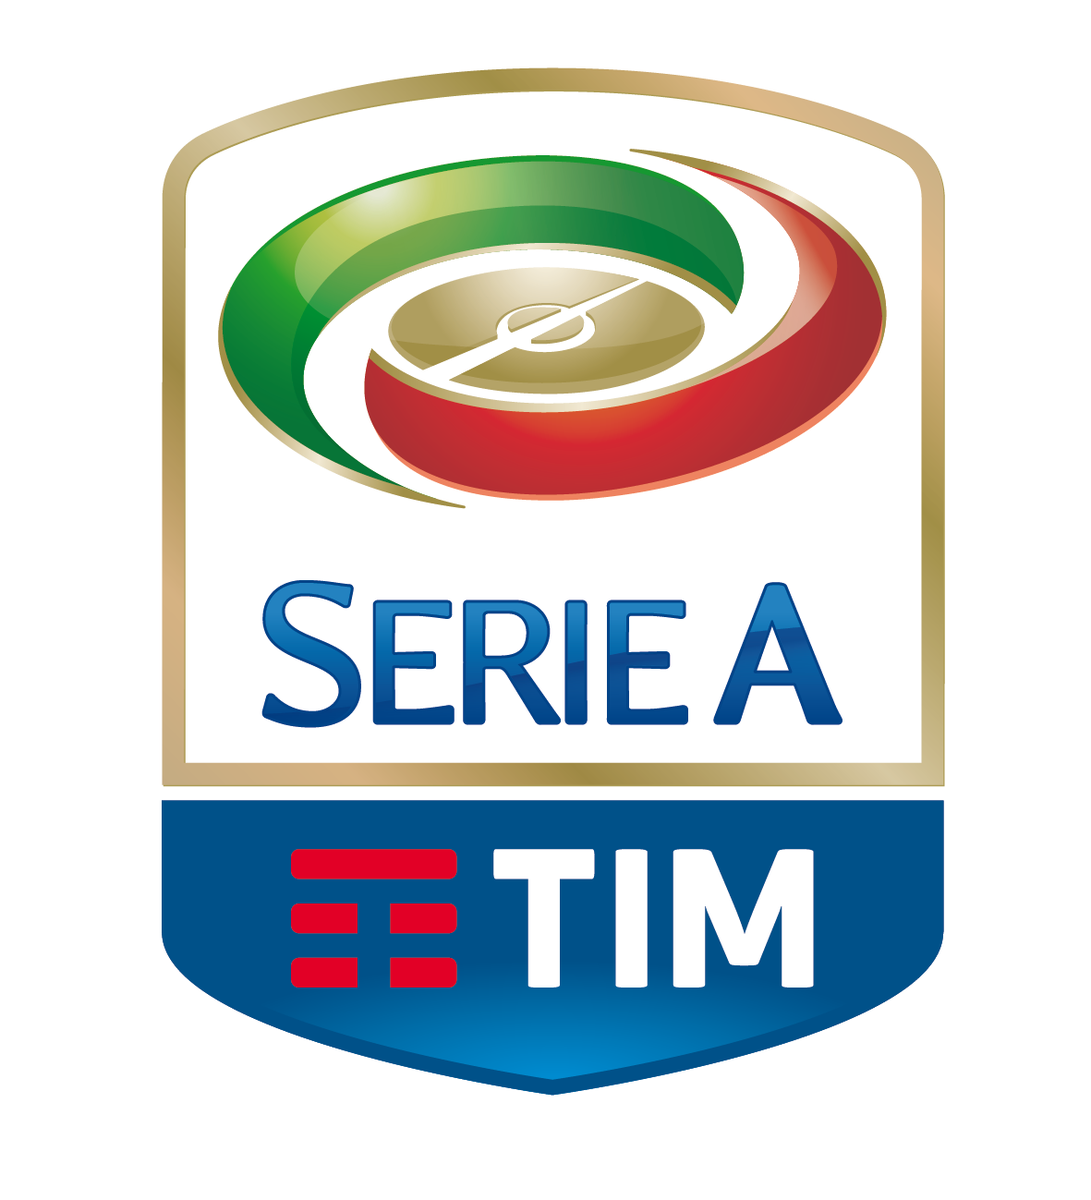 [#SerieA] Classement - J1    AC Milan 3pts   Inter Milan 3pts   Juventus 3pts   Naples 3pts   Chievo 3pts <br>http://pic.twitter.com/Rr3rLmUjLG